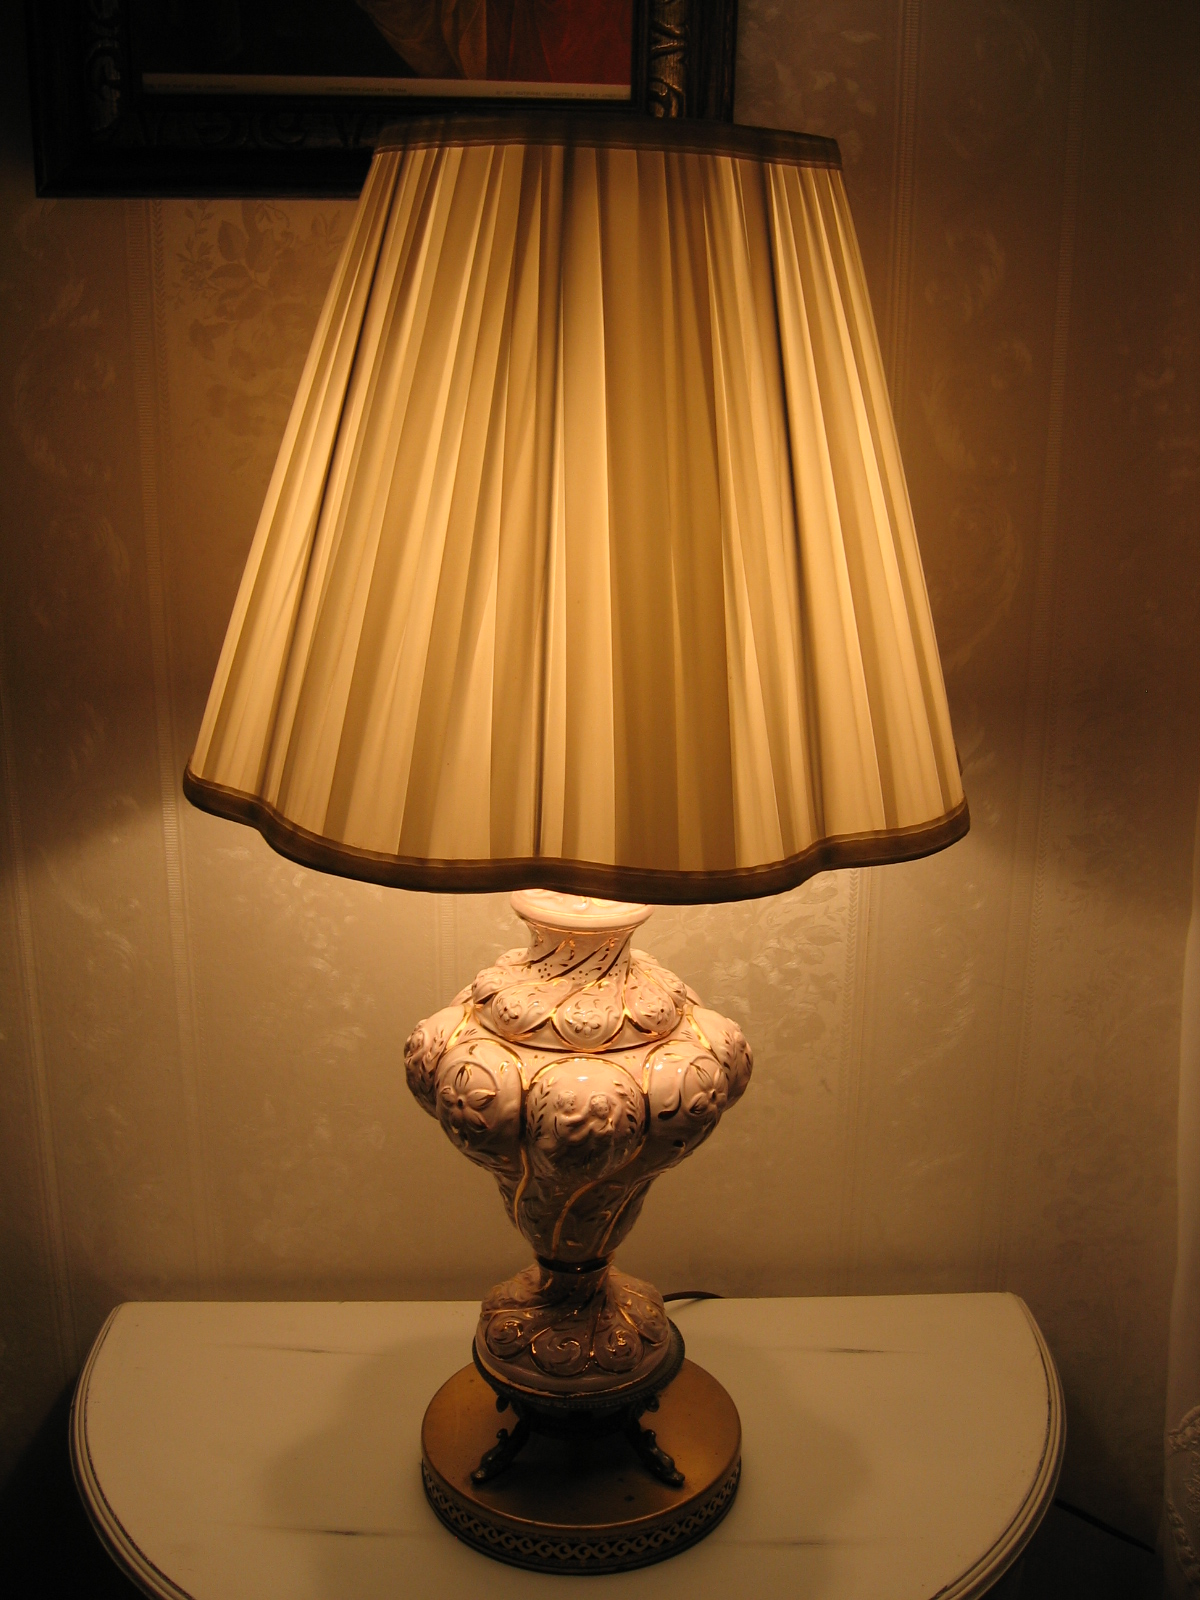 Top 10 Old Antique Lamps 2020 Warisan